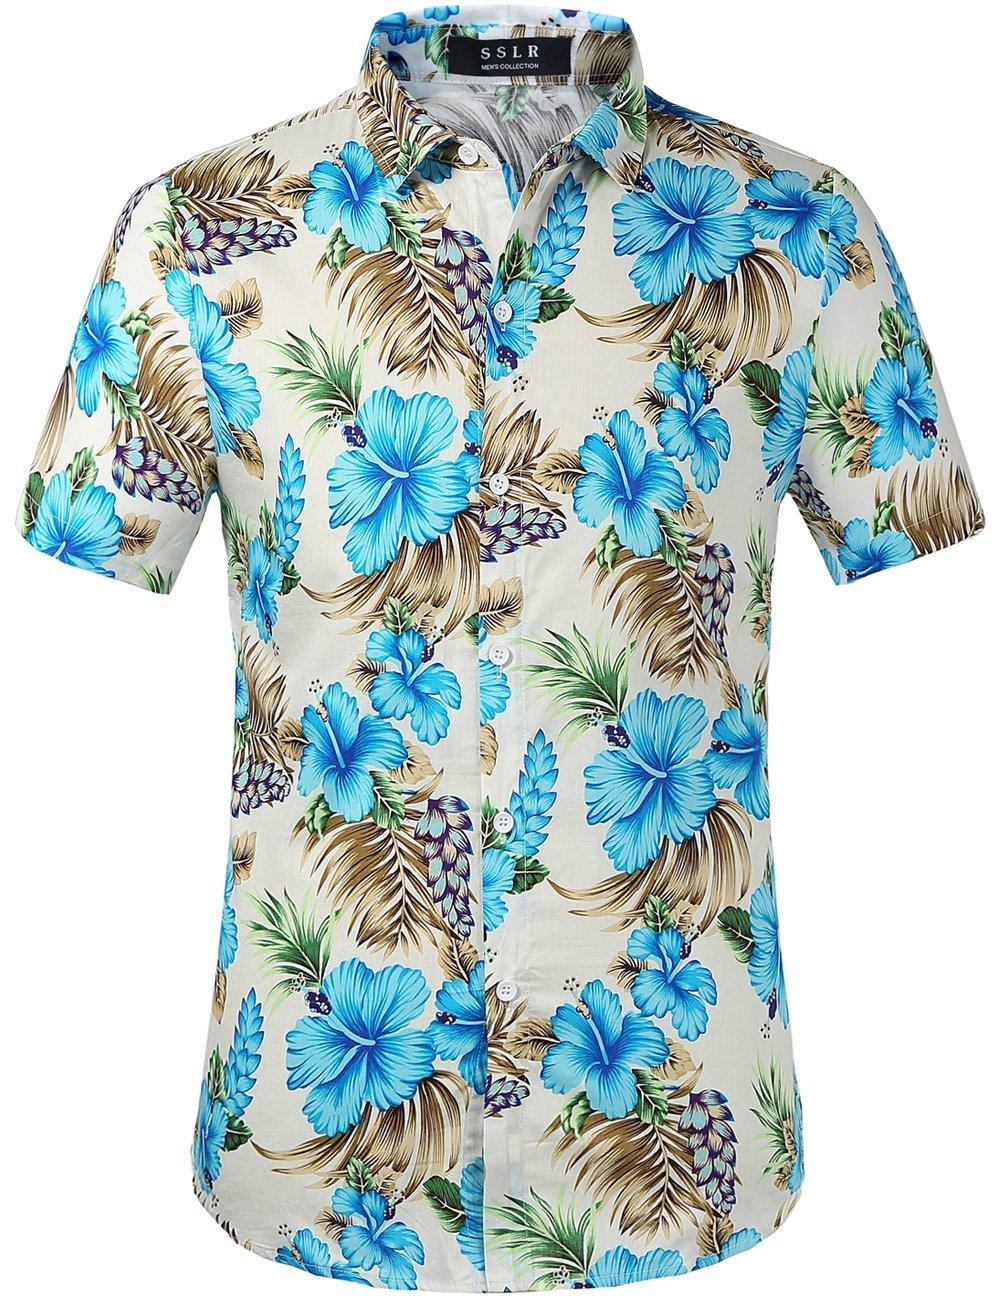 SSLR Men's Button Down Causal Short Sleeve Aloha Hawaiian Shirts AFD168-58/59/66-ca SN-AFD168-58/59/66